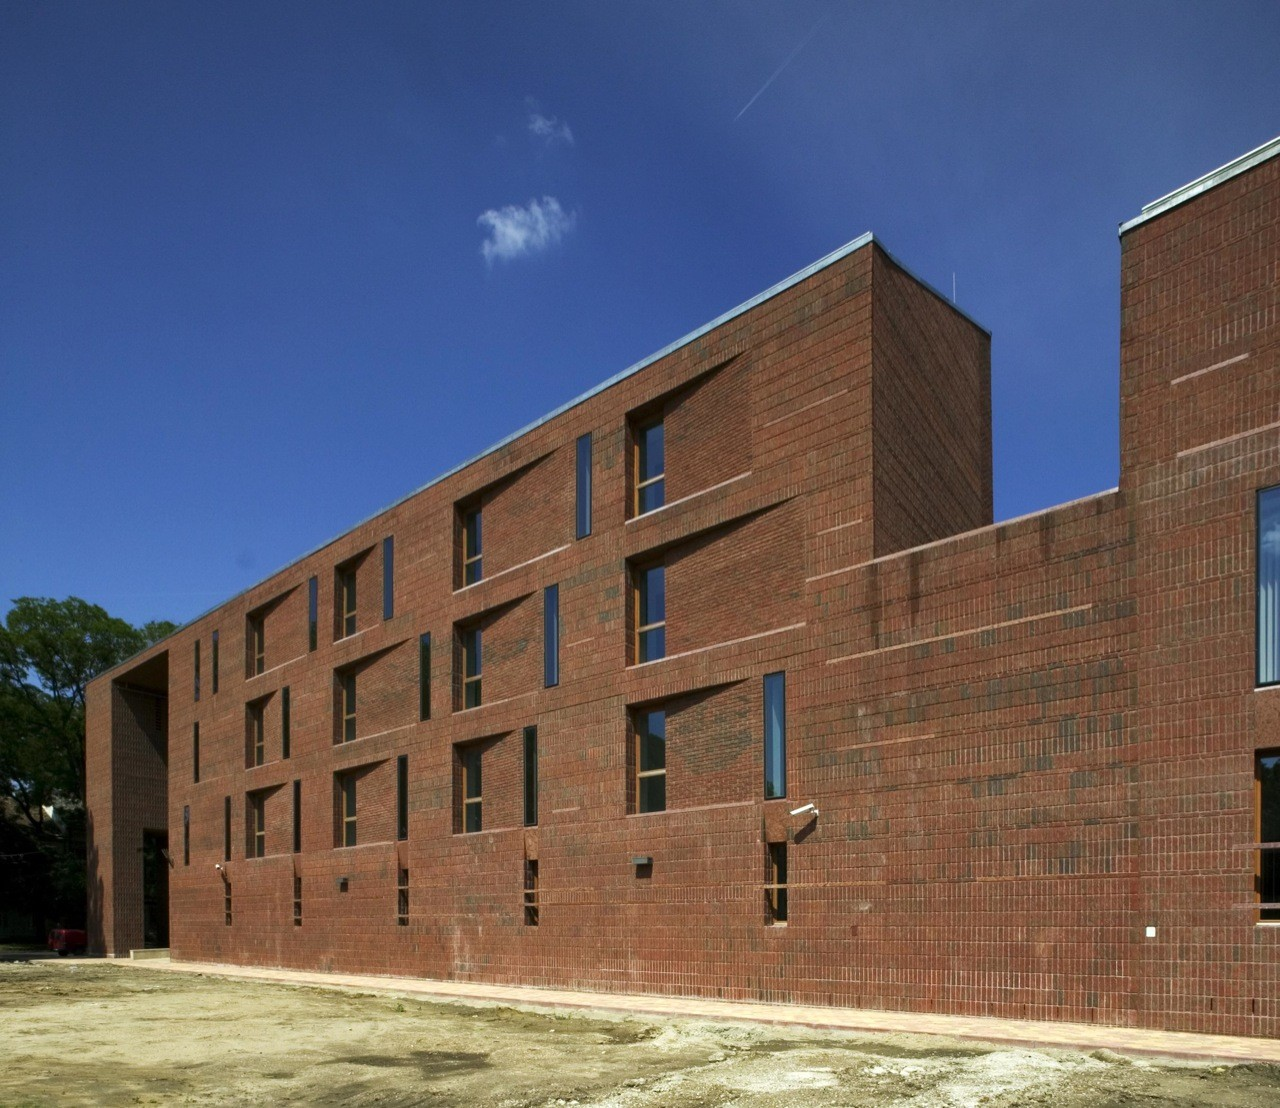 Judicial Centre in Debrecen / Koller Studio, Courtesy of  koller studio